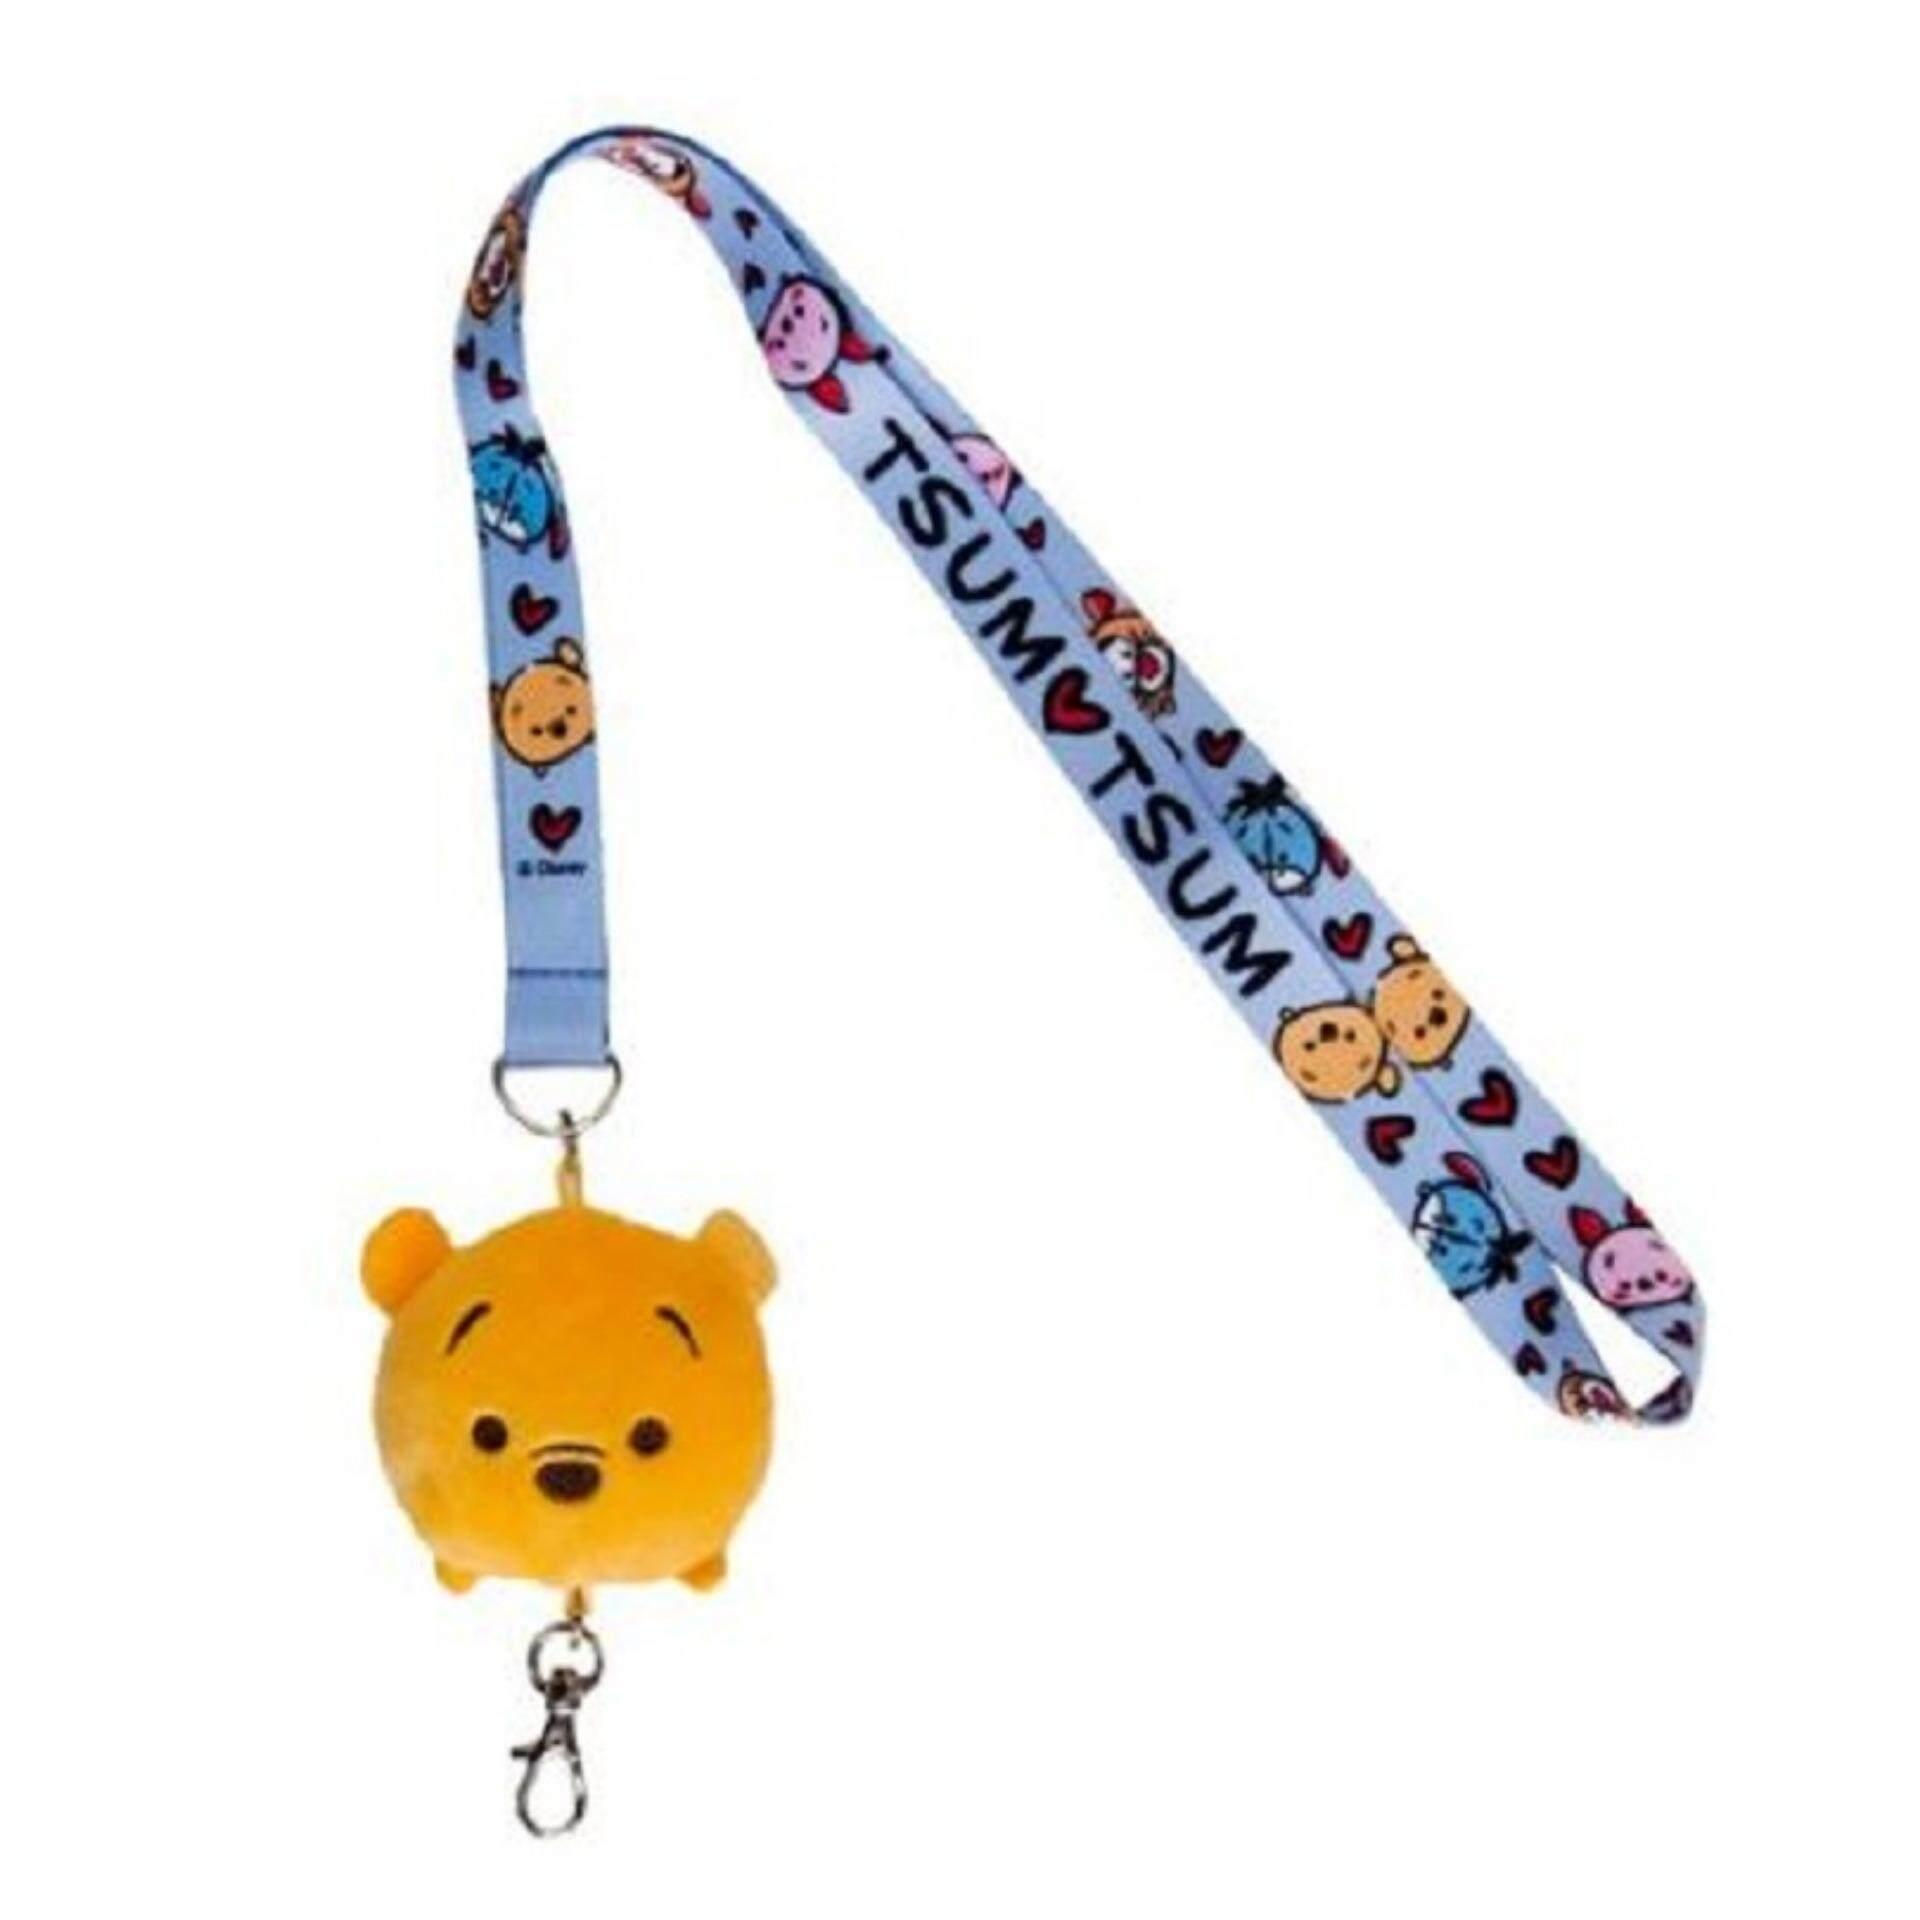 Disney Tsum Tsum Lanyard - Winnie The Pooh